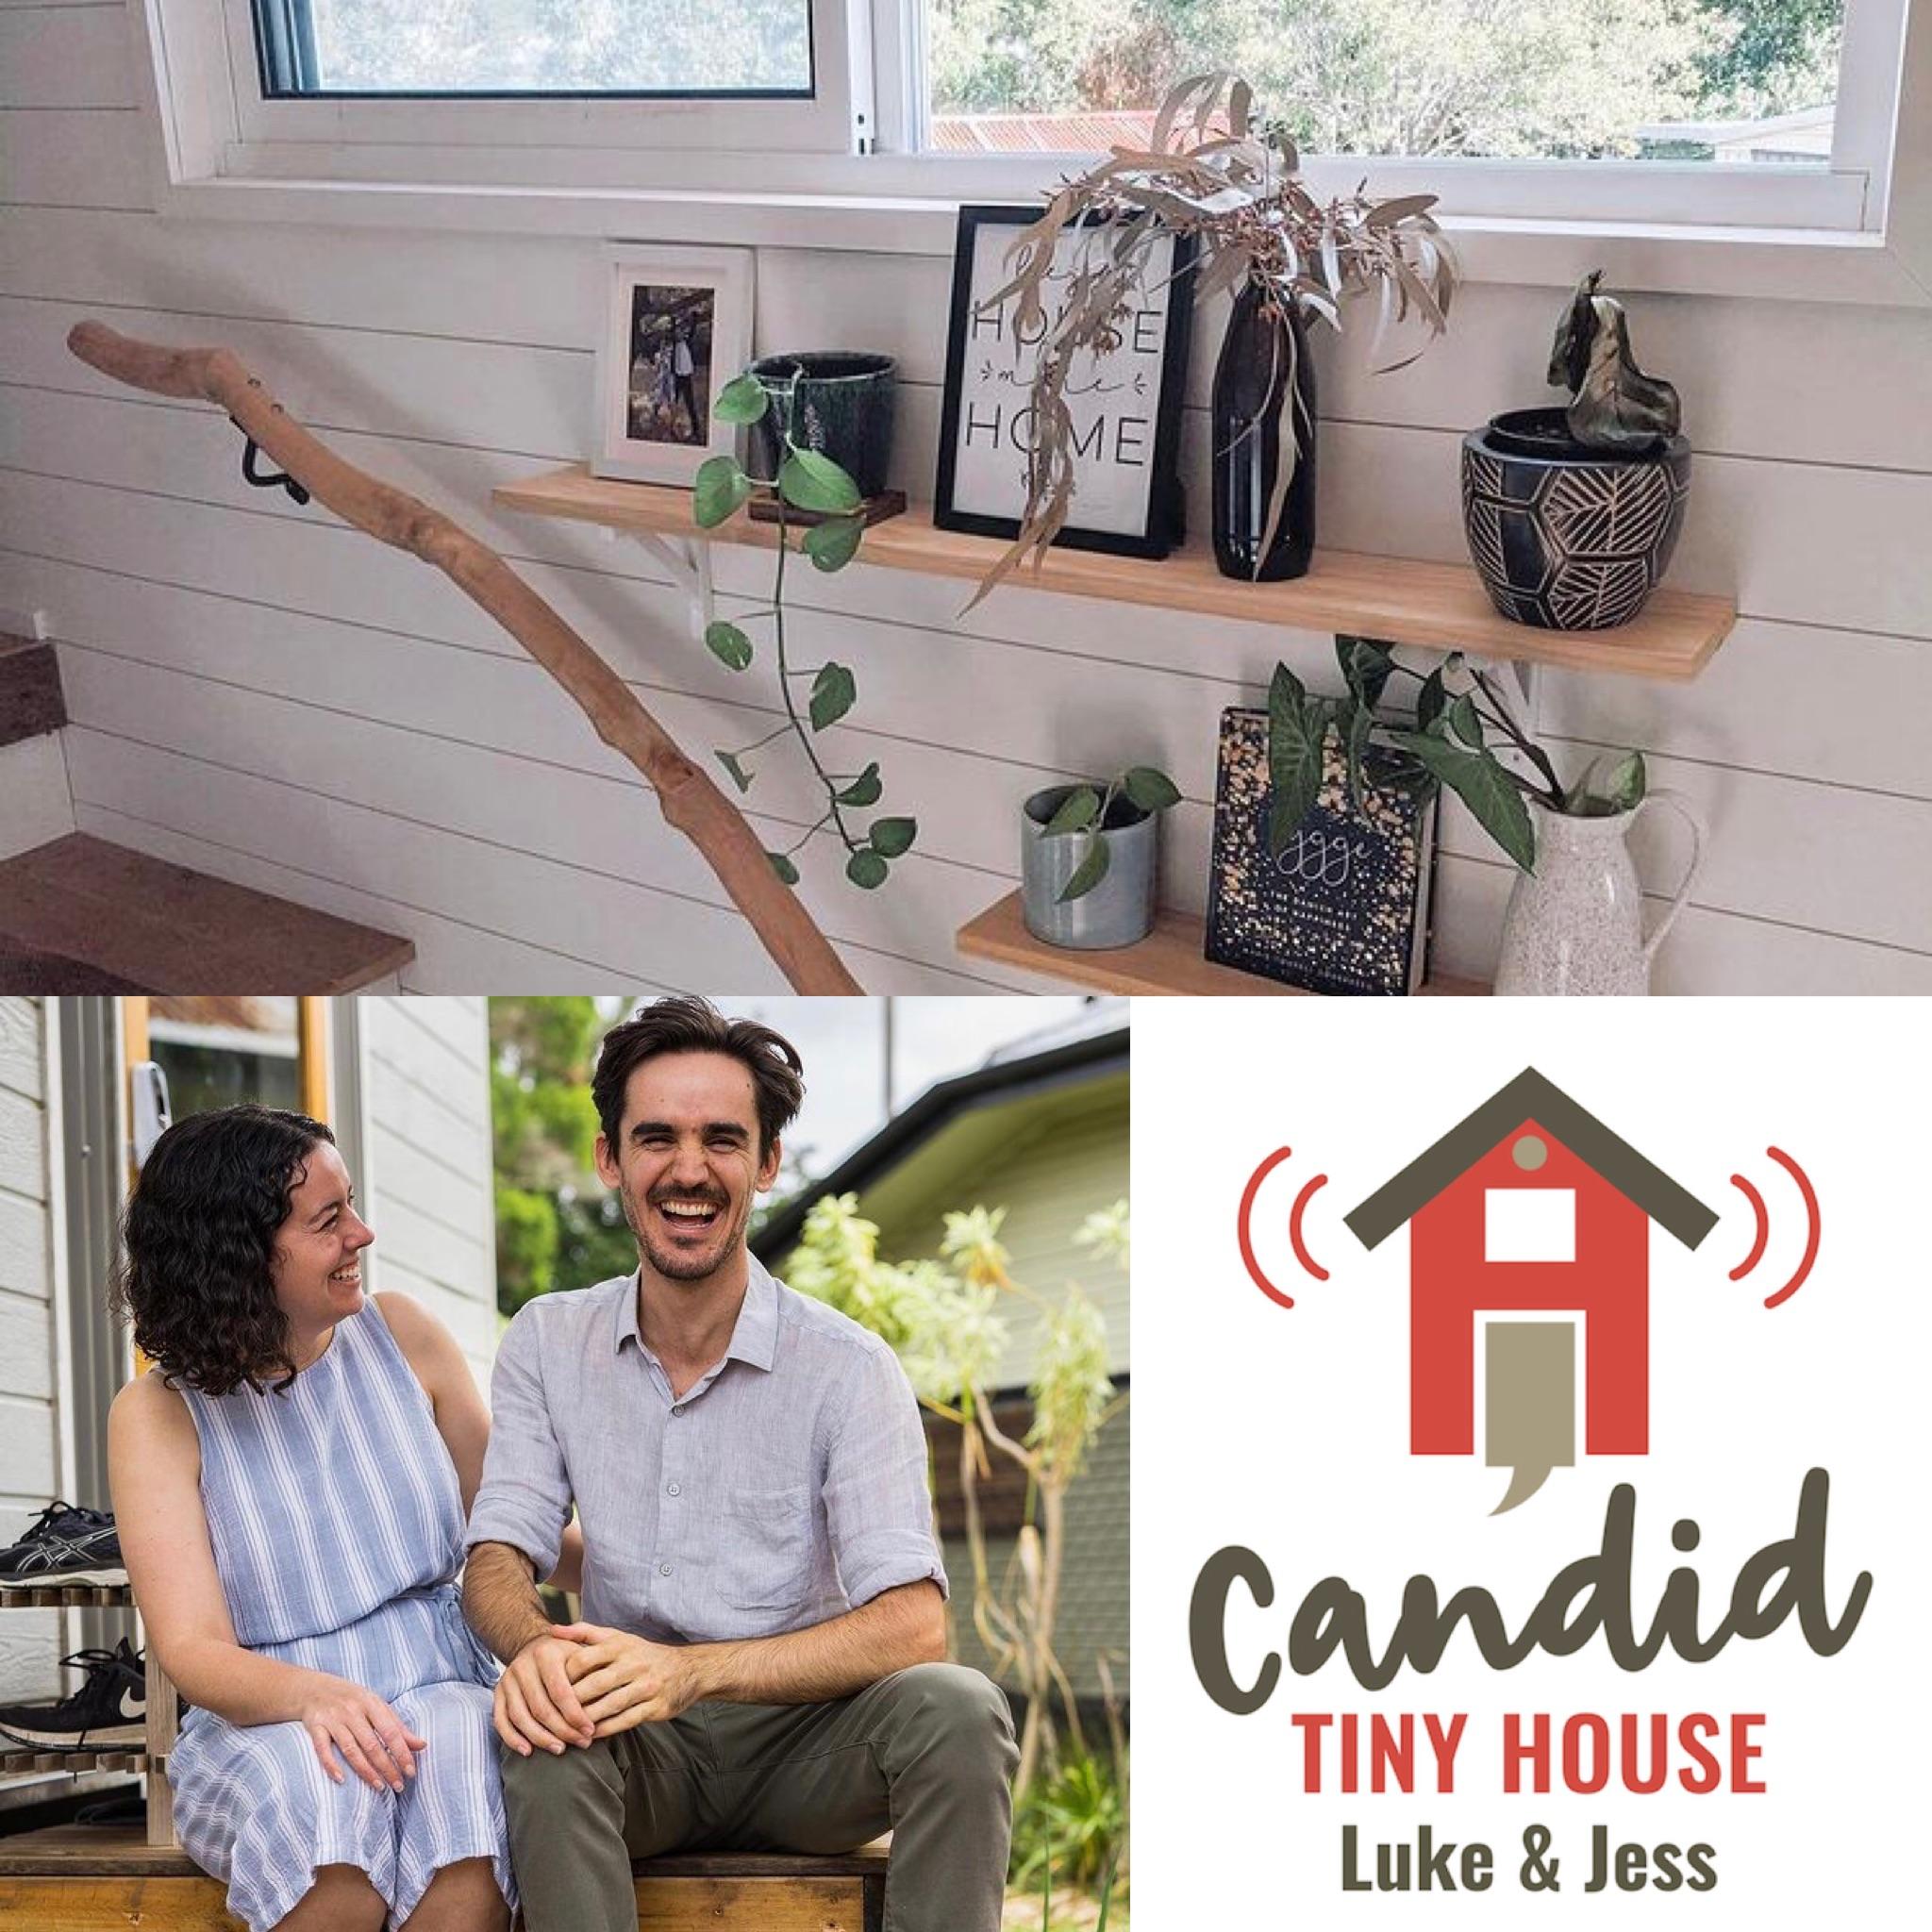 Luke and Jess Candid Tiny House